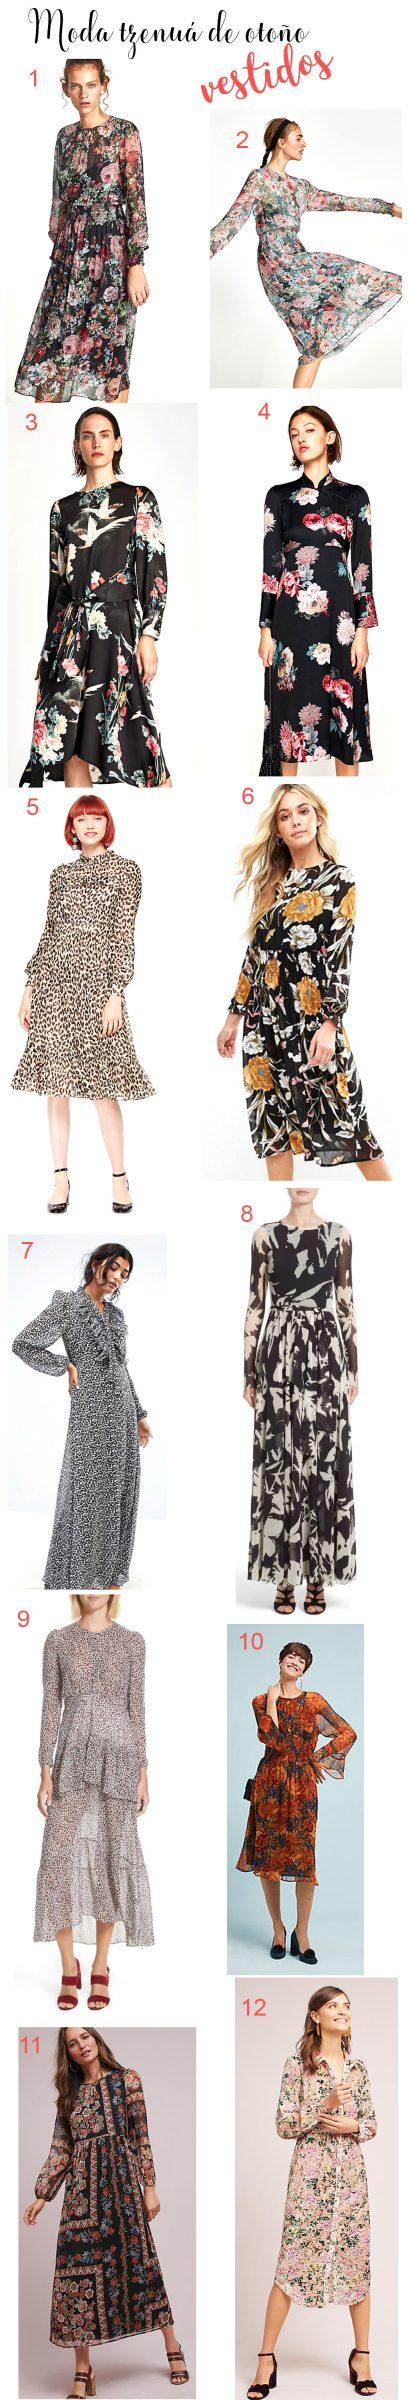 moda tzenuá de otoño